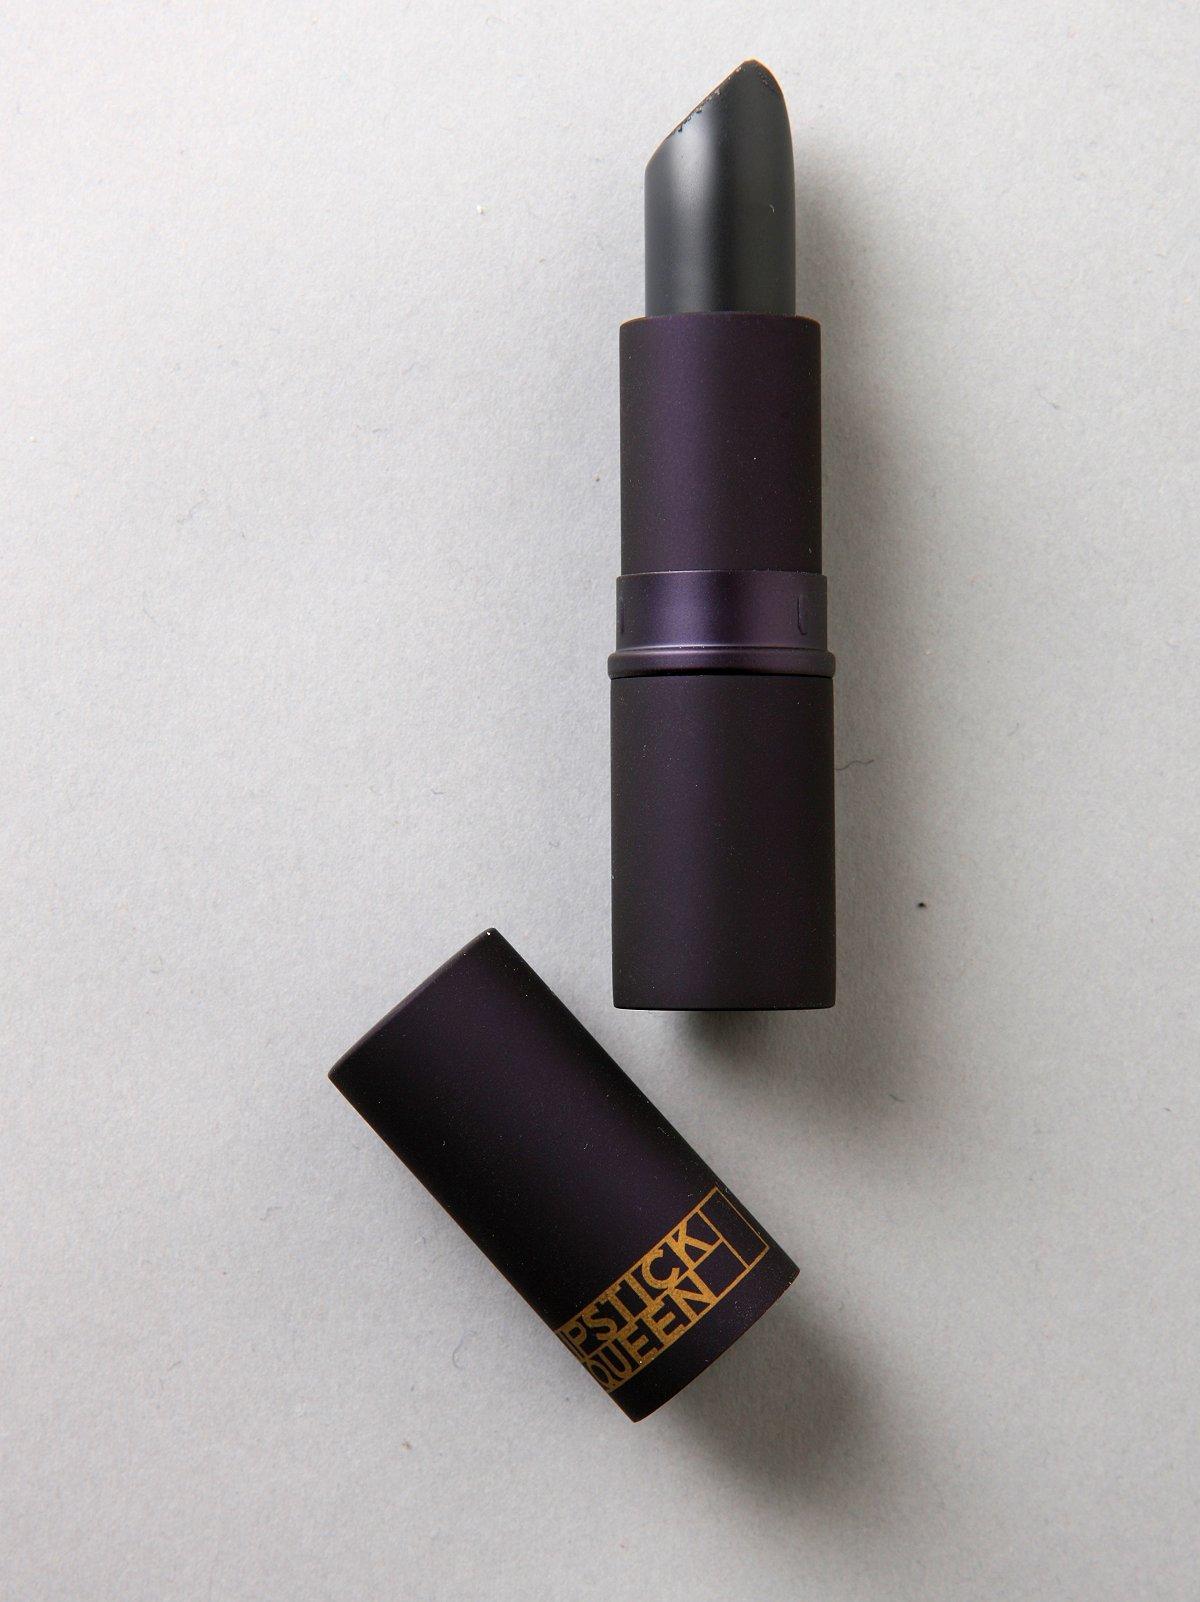 Black Lace Lipstick